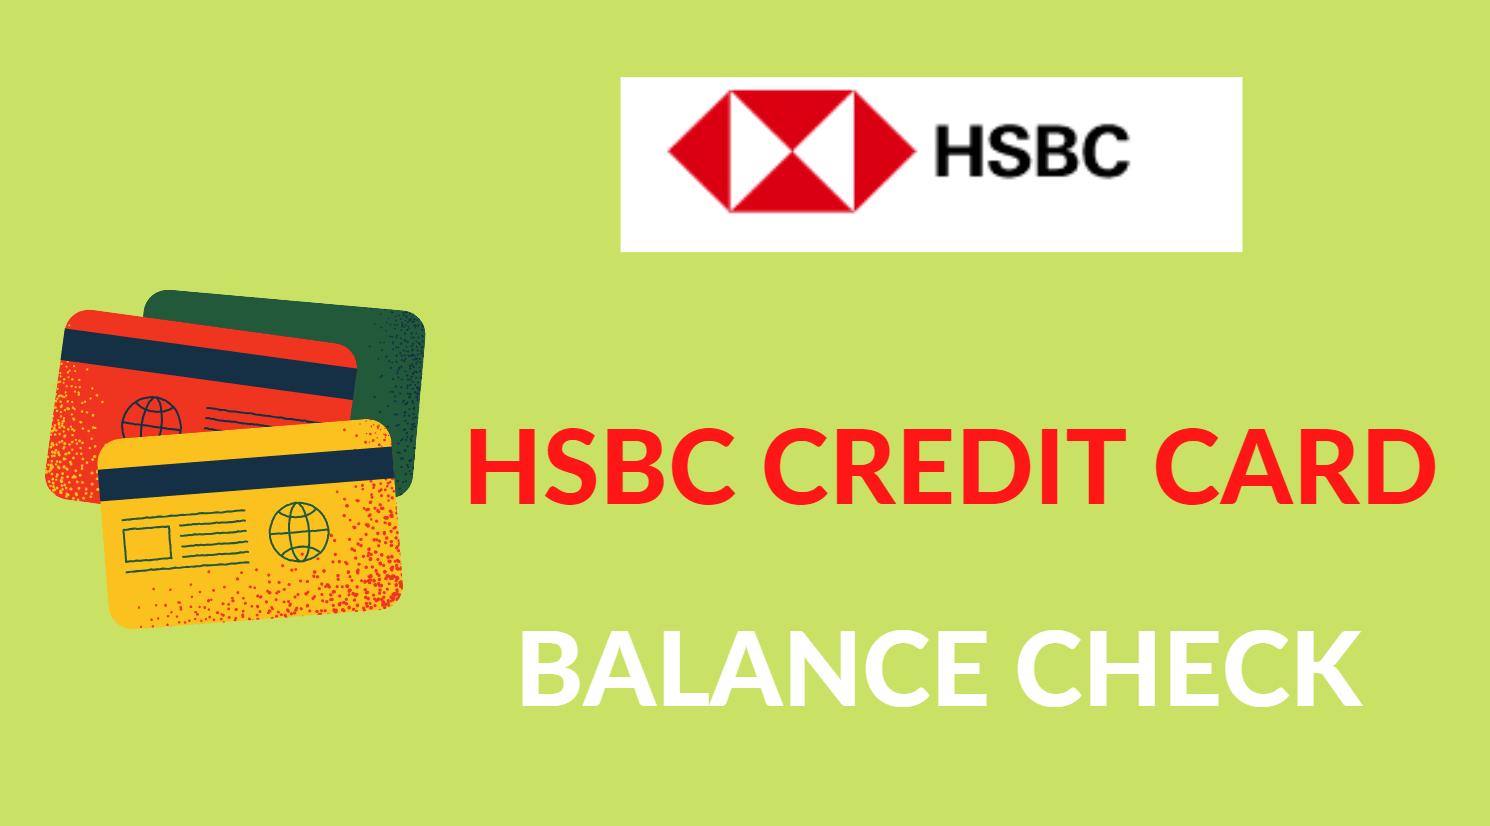 hsbc credit card balance check